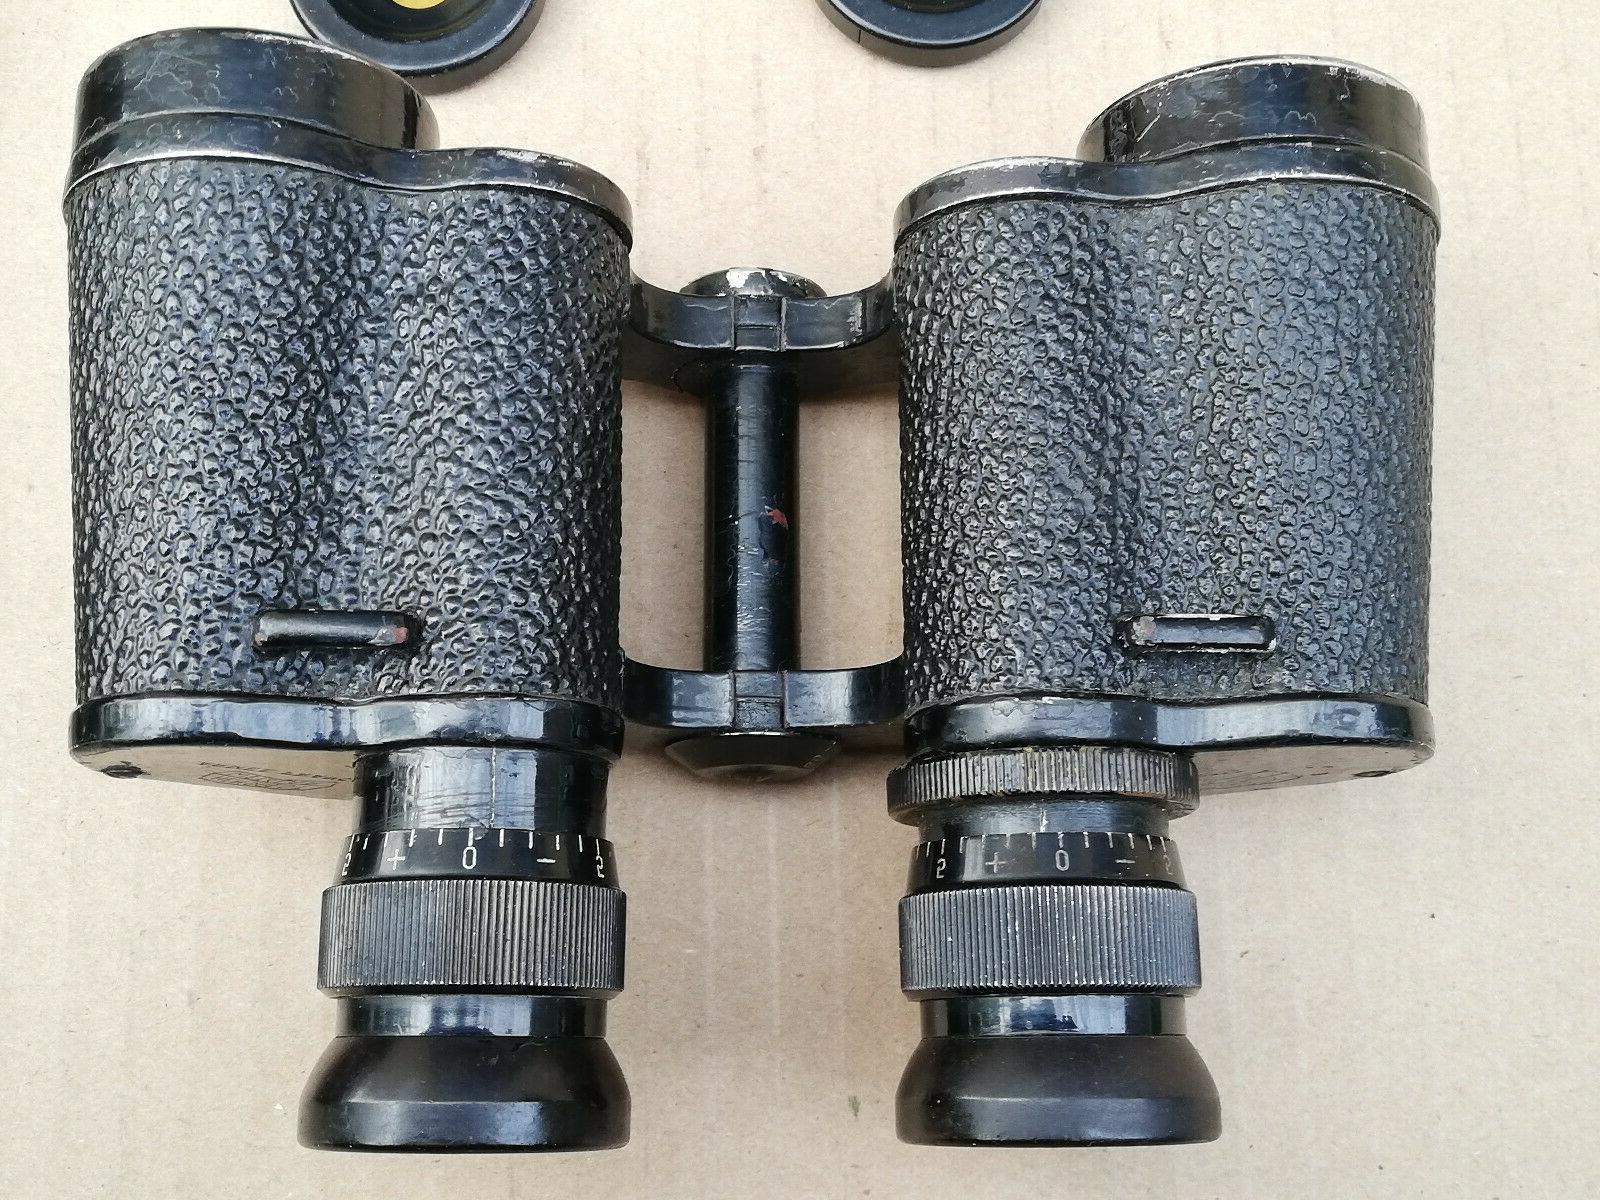 paire de jumelles wetzlar 8x30 fab allemande